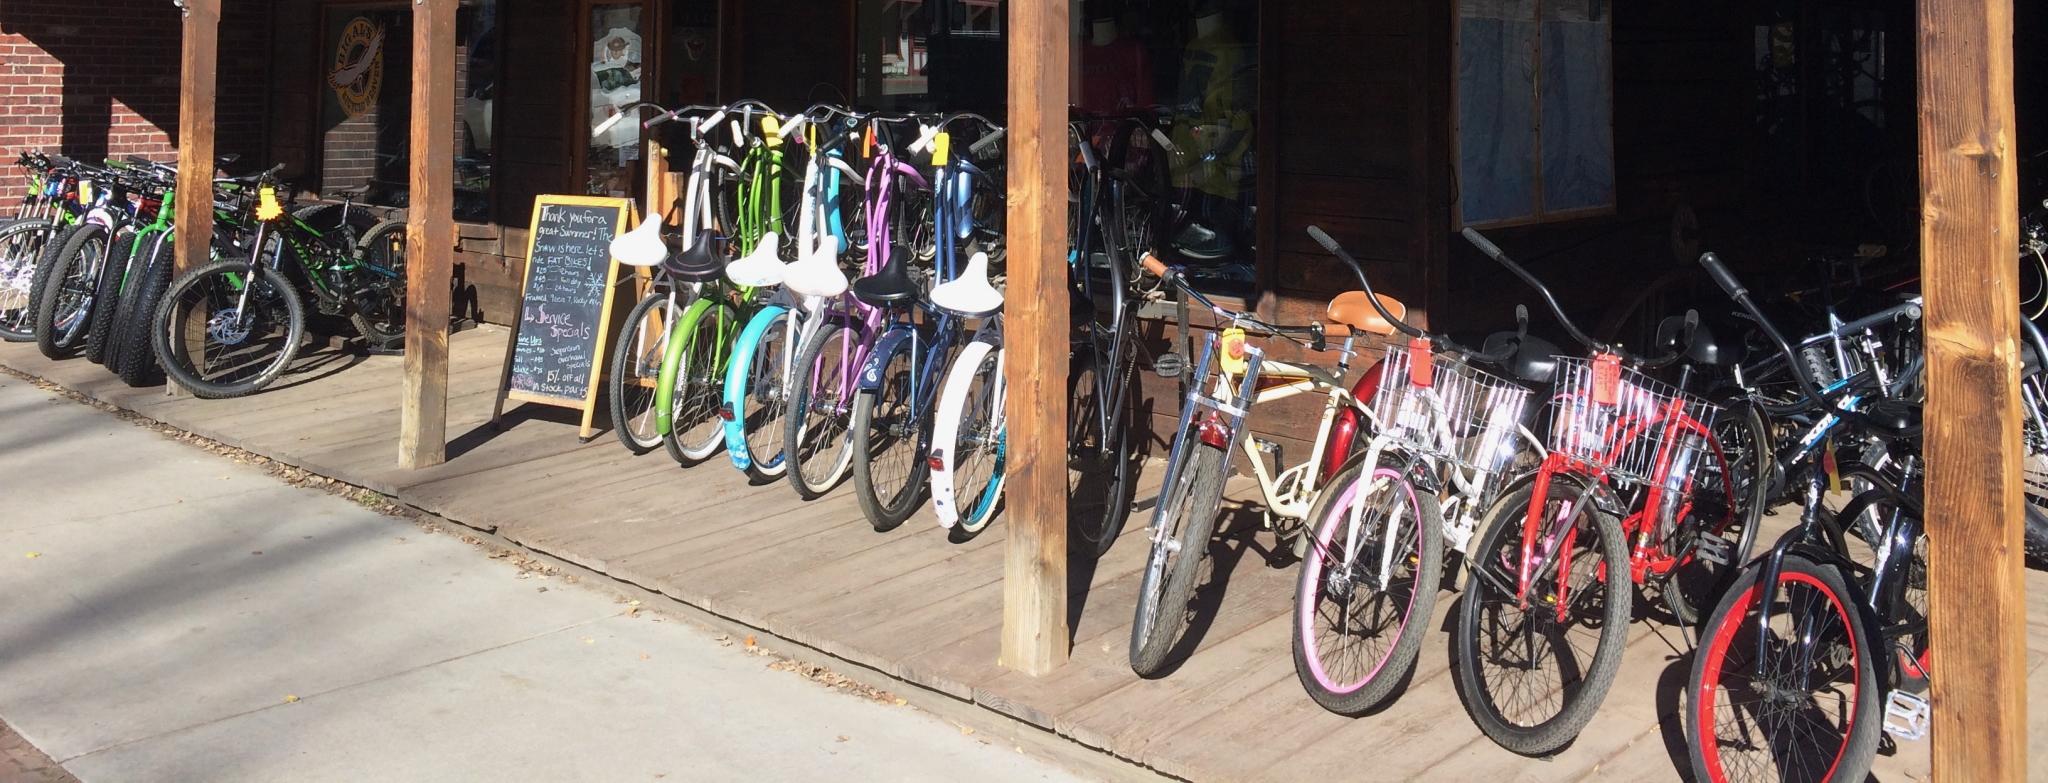 Big Al's Bicycle Heaven Crested Butte Bike Rentals